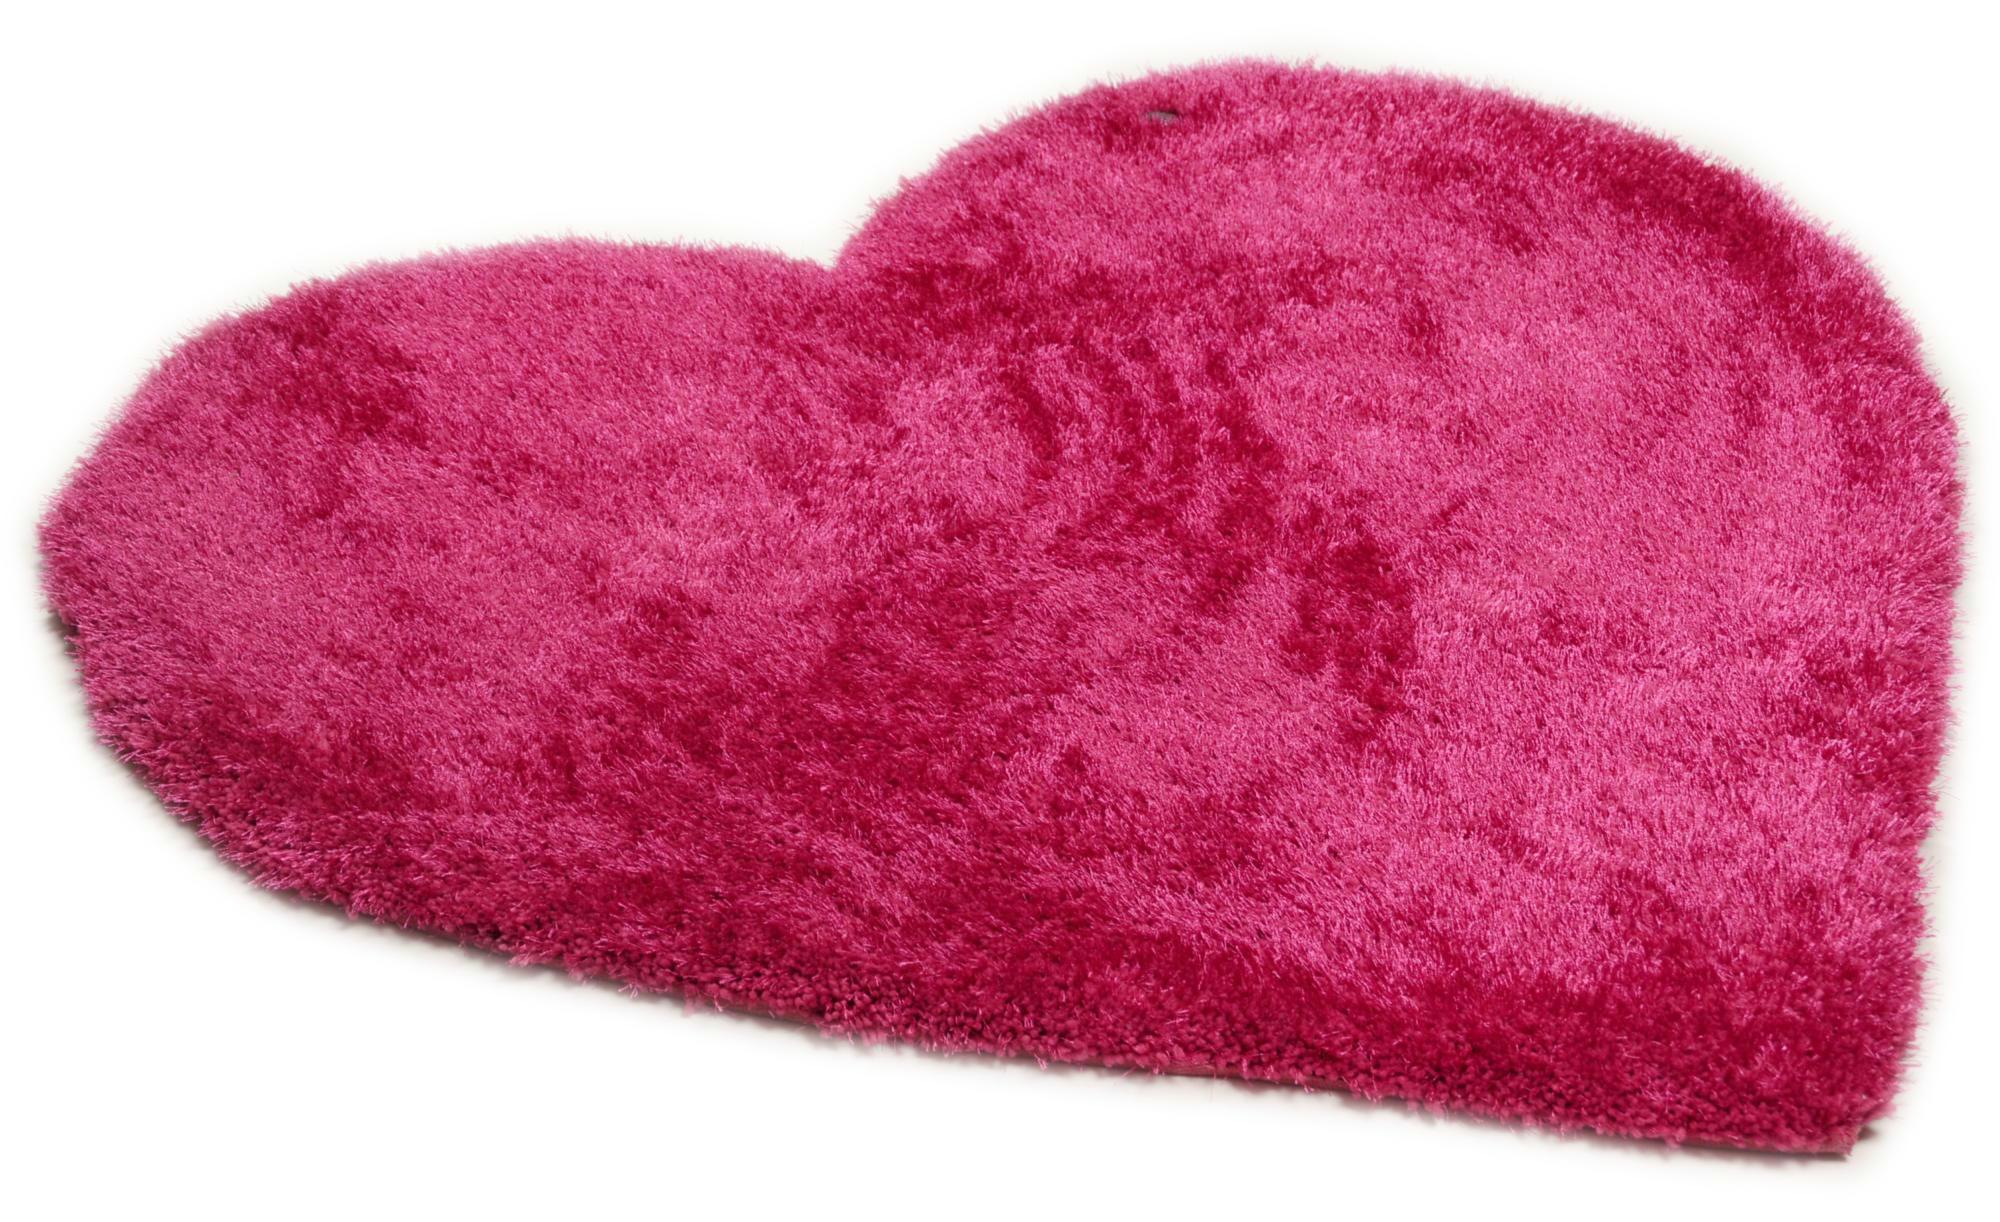 Tom Tailor Handtuft-Teppich  Soft Kids ¦ rosa/pink ¦ 100 % Polypropylen ¦ Maße (cm): B: 100 Teppiche > Kinderteppiche - Höffner